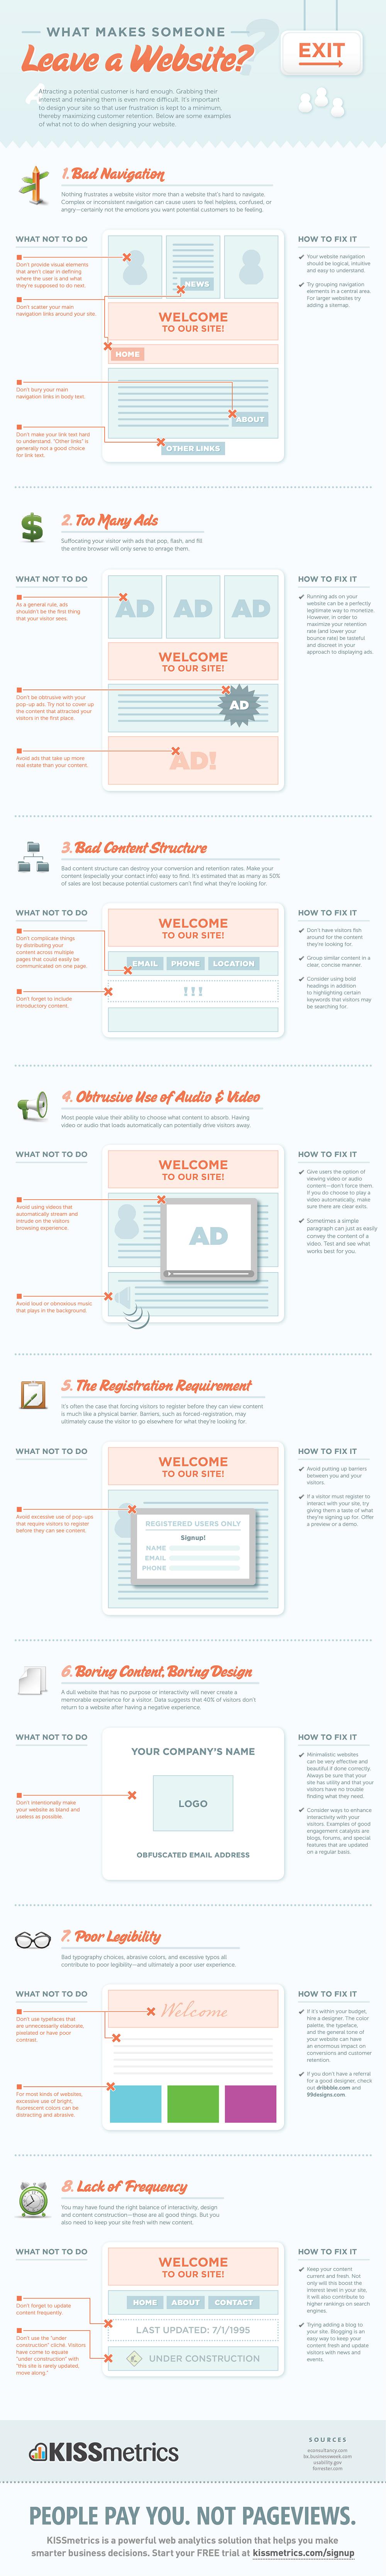 infografica sito web efficace